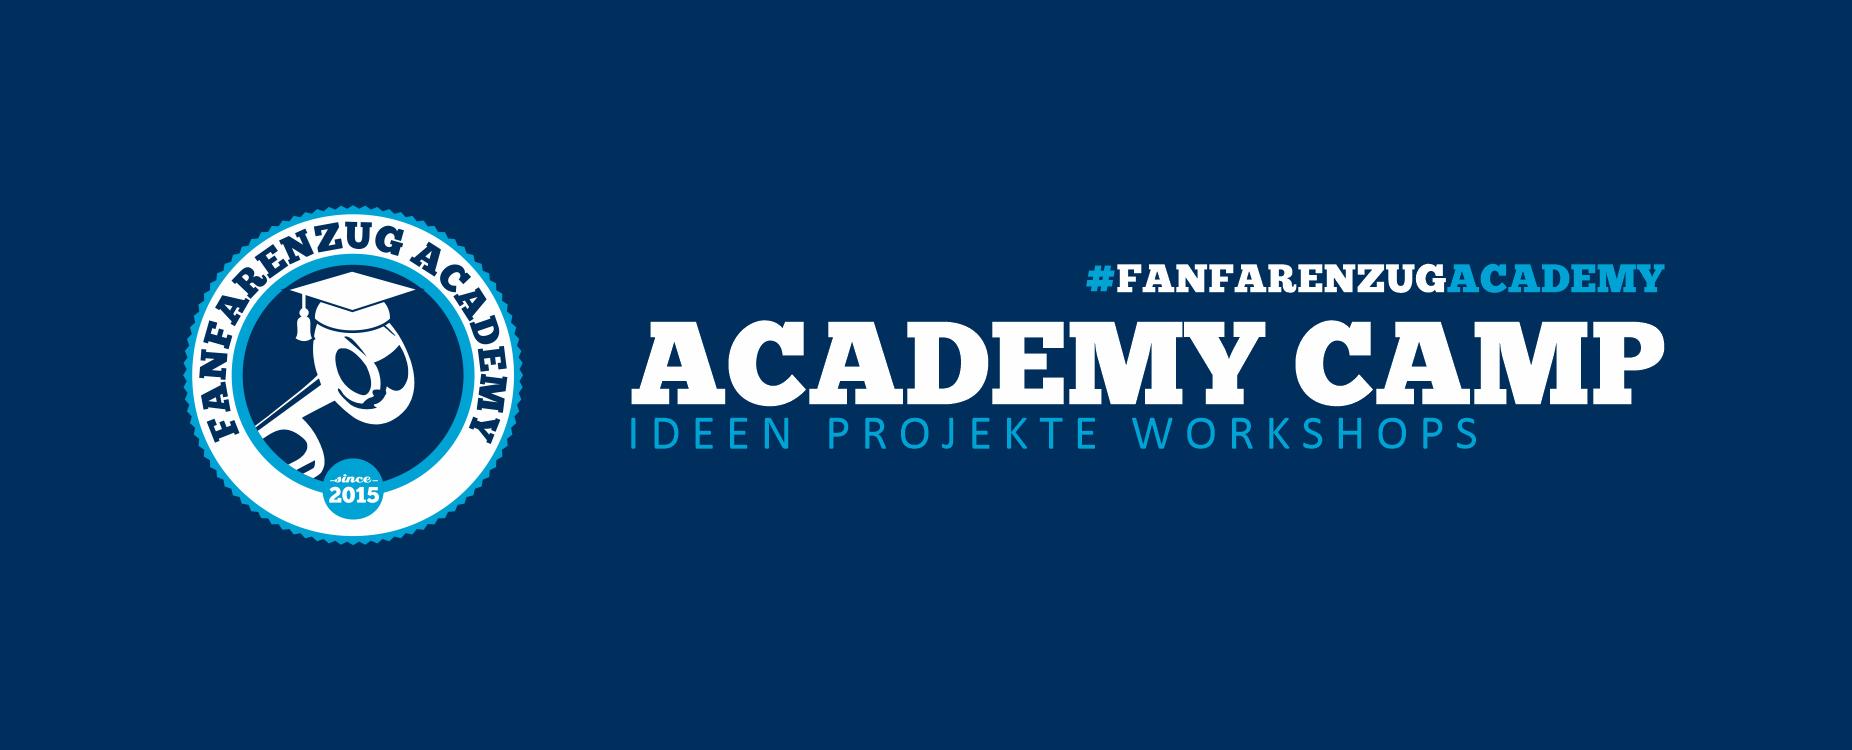 "19. - 20. SEPTEMBER 2020 | STRAUSBERG MITGLIEDERVERSAMMLUNG IDEEN WORKSHOPS Unser großes Zusammentreffen zum Austauschen, Vernetzen, zur Entwicklung neuer Ideen und Schwerpunkte. [themify_button link=""http://fanfarenzug-academy.de/academy-camp"" style=""small flat"" color=""#00a0e3"" text=""#ffffff"" ]INFOS[/themify_button]"